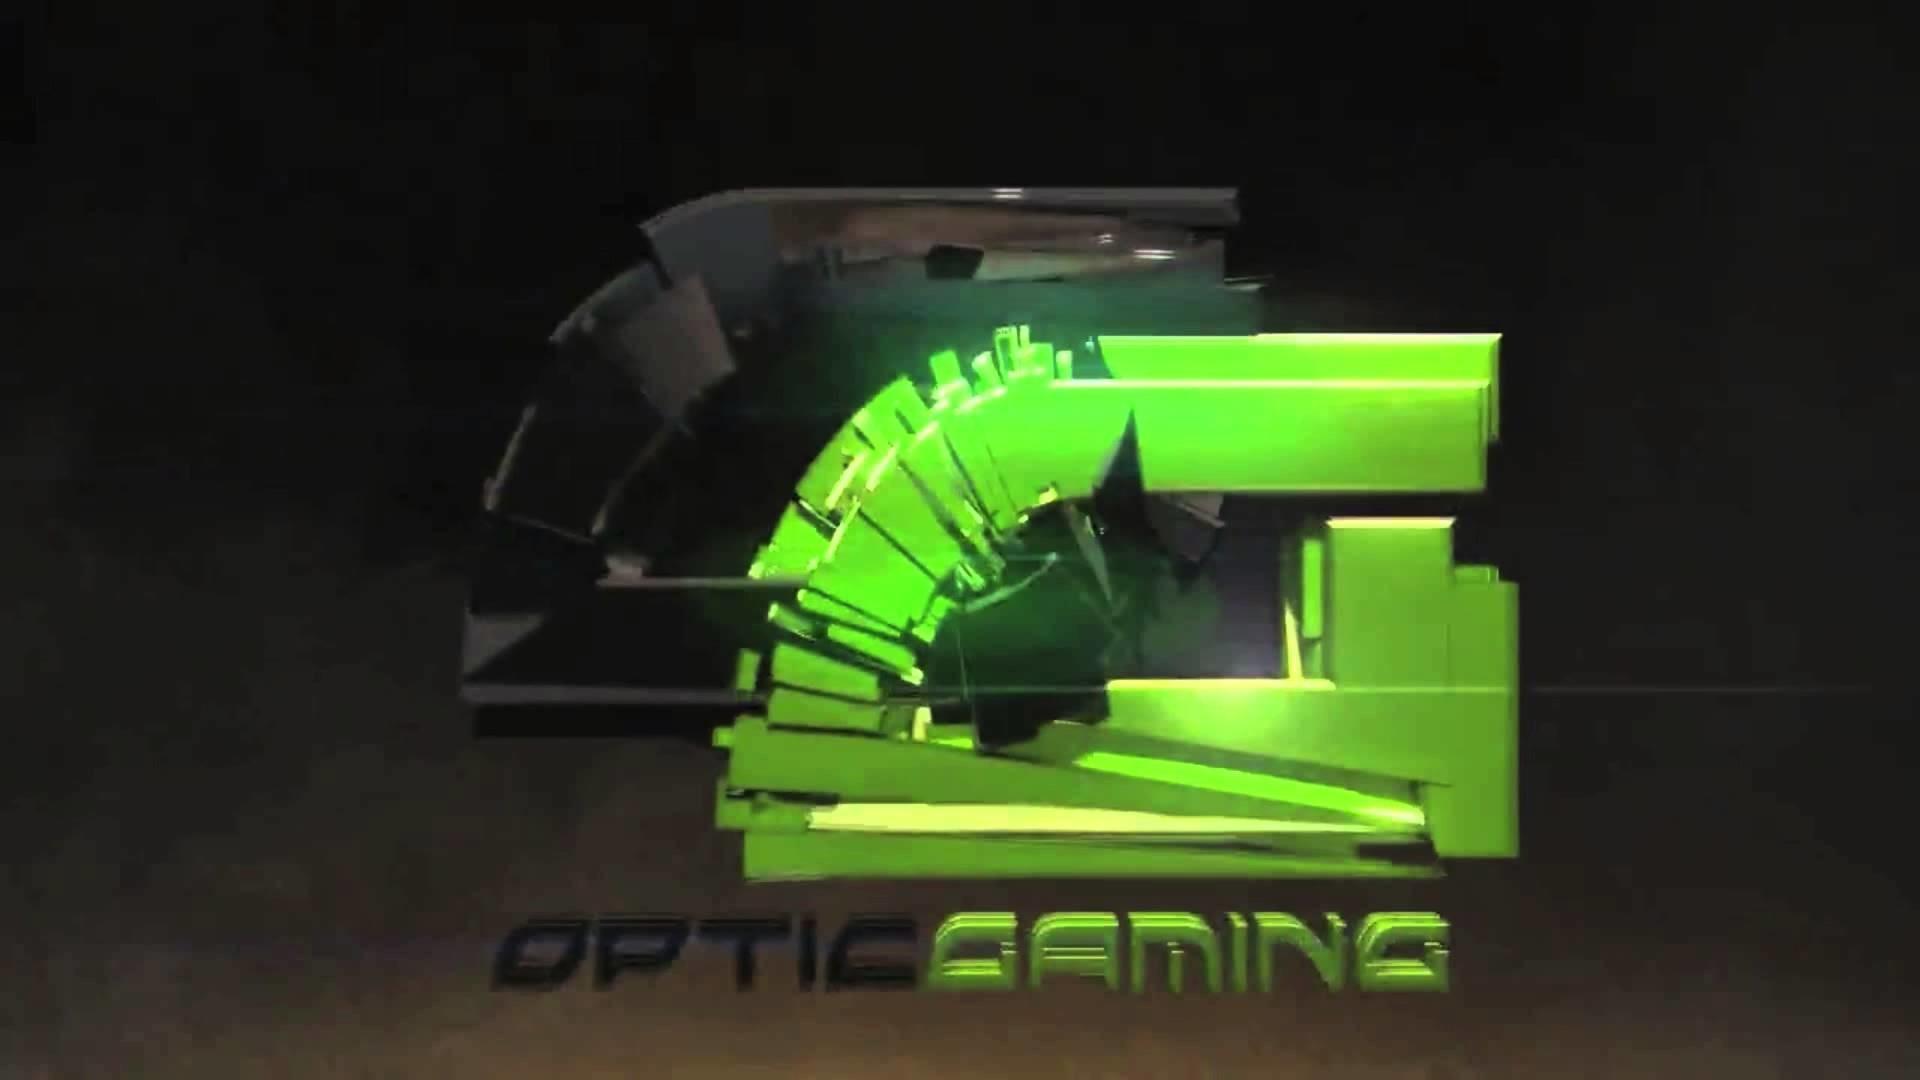 OpTic Gaming intros